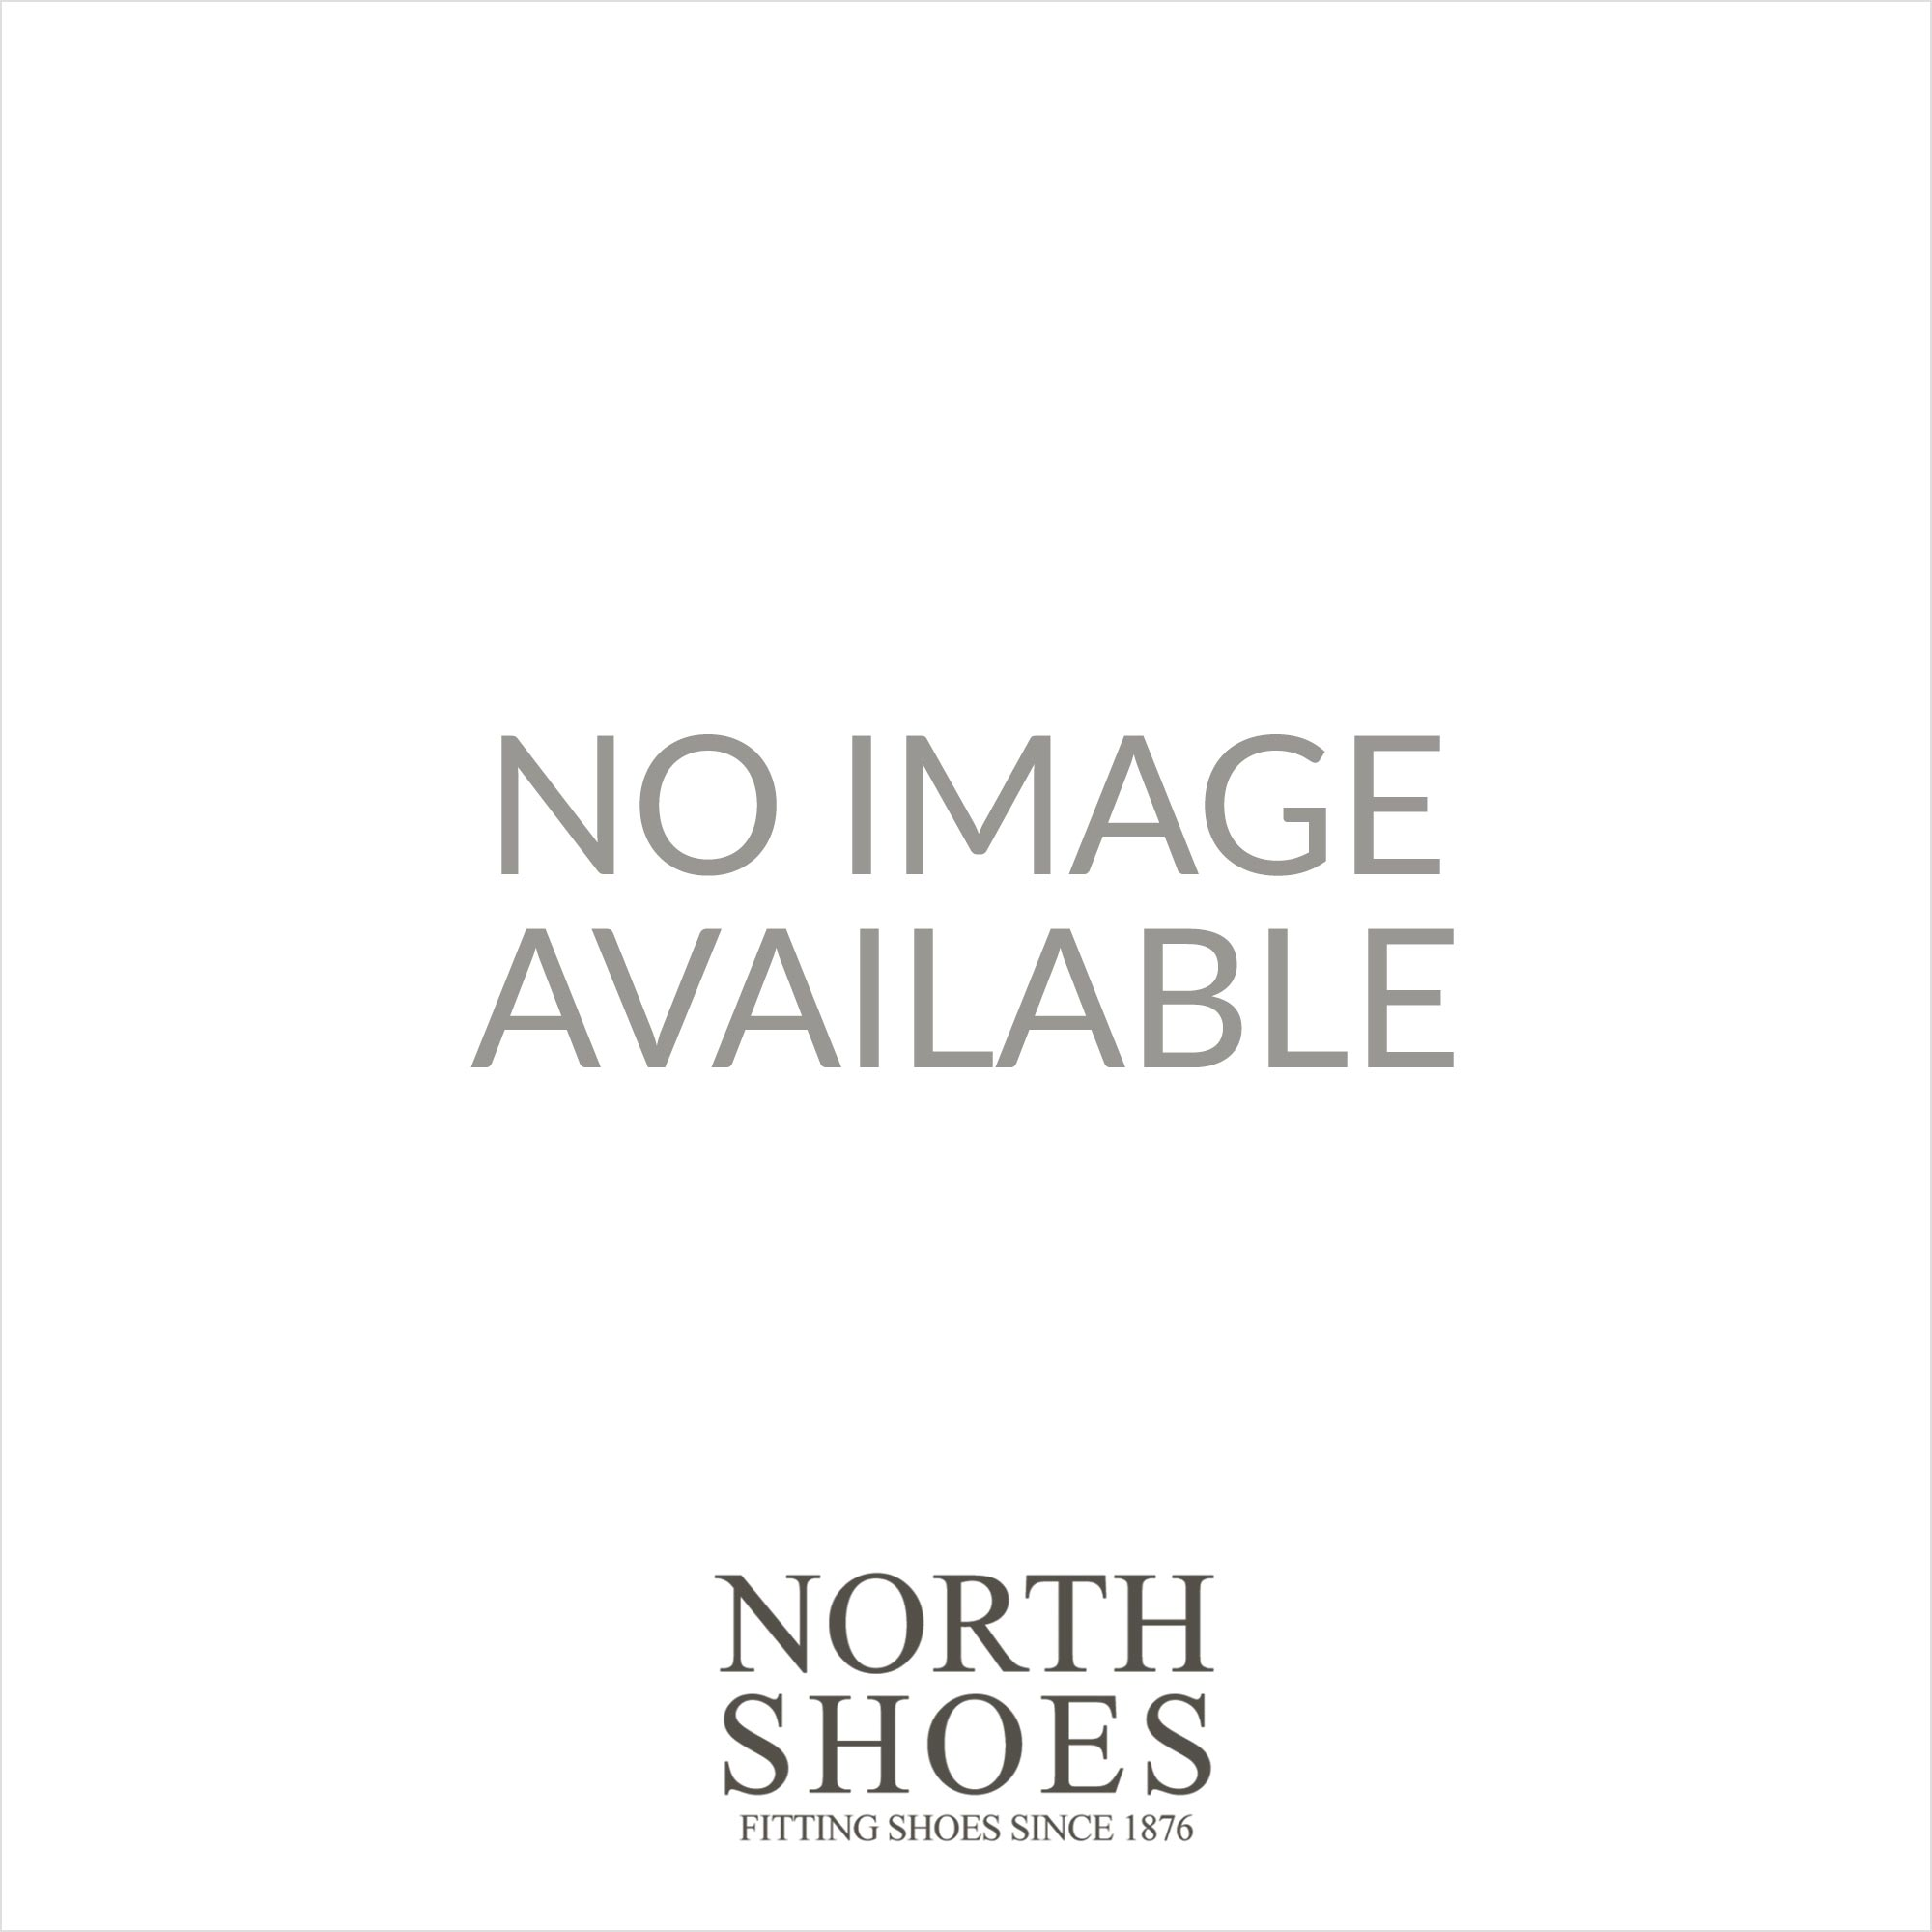 38de87a4e268 ... Fitflop The Skinny Lizard Leather Womens Toe Post Sandal - UK 4 ...